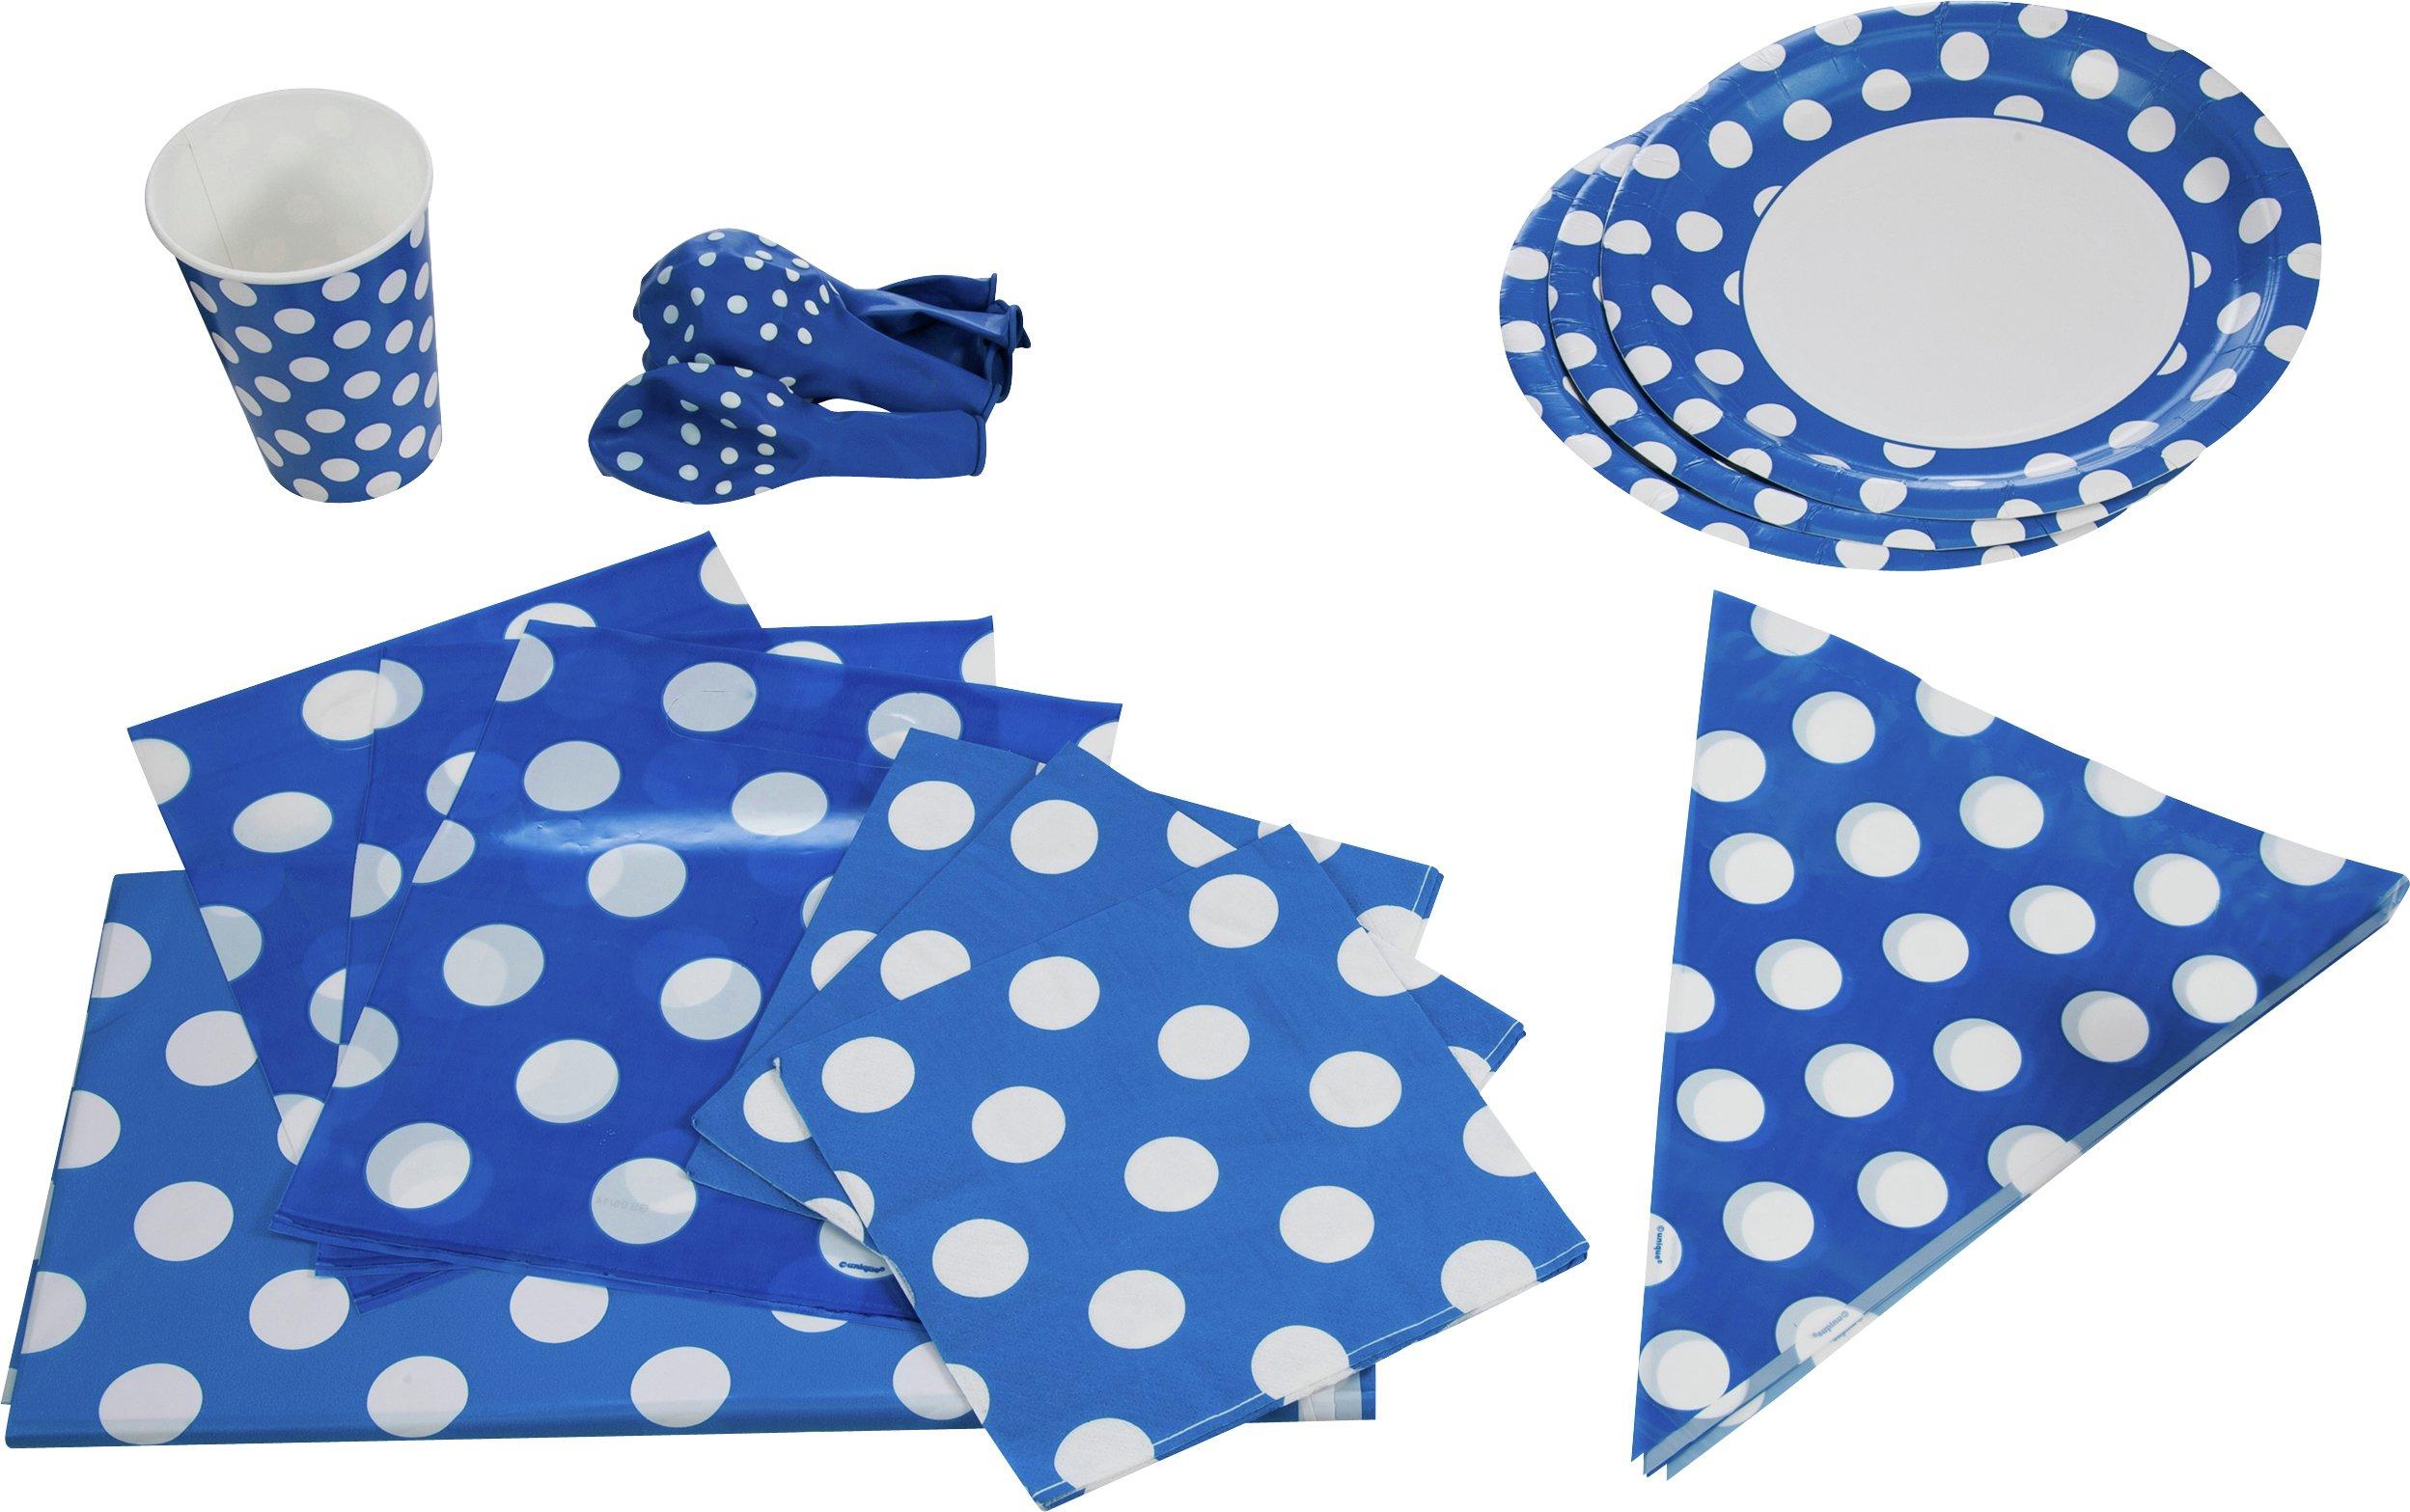 Decorative Dots Party Kit for 16 - Royal Blue